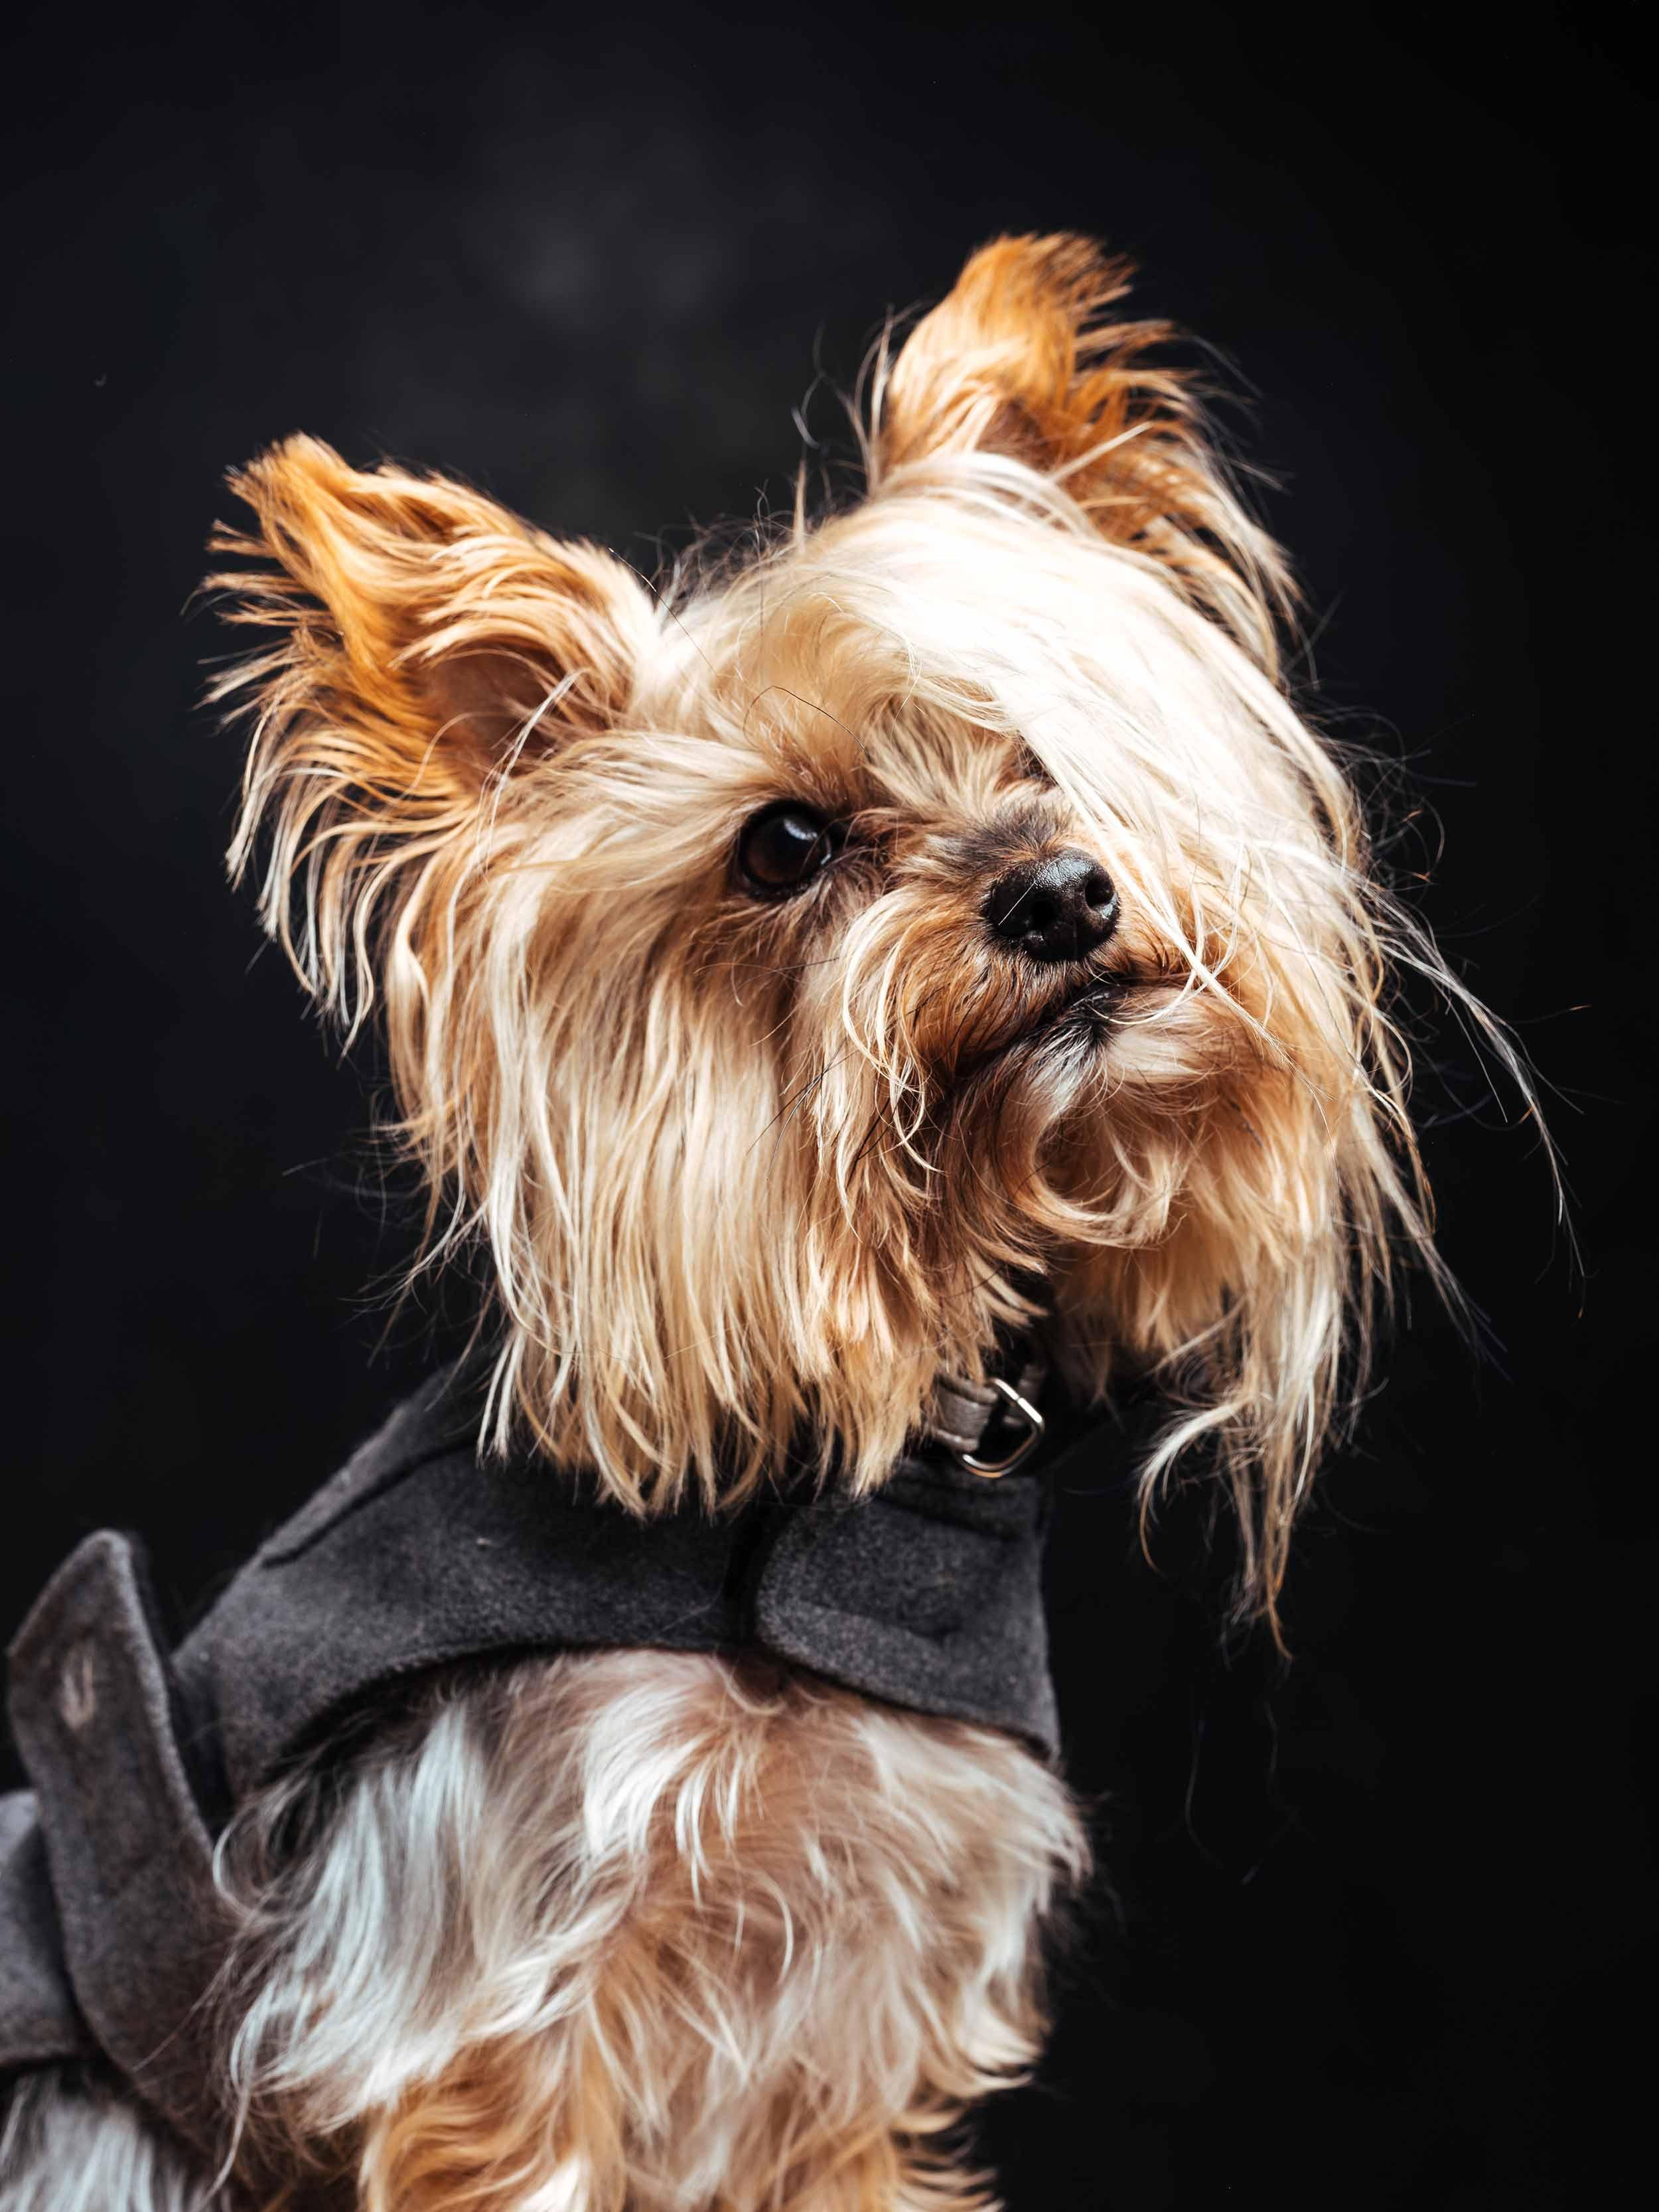 12.01---Dogs-Life_0003_9635.jpg